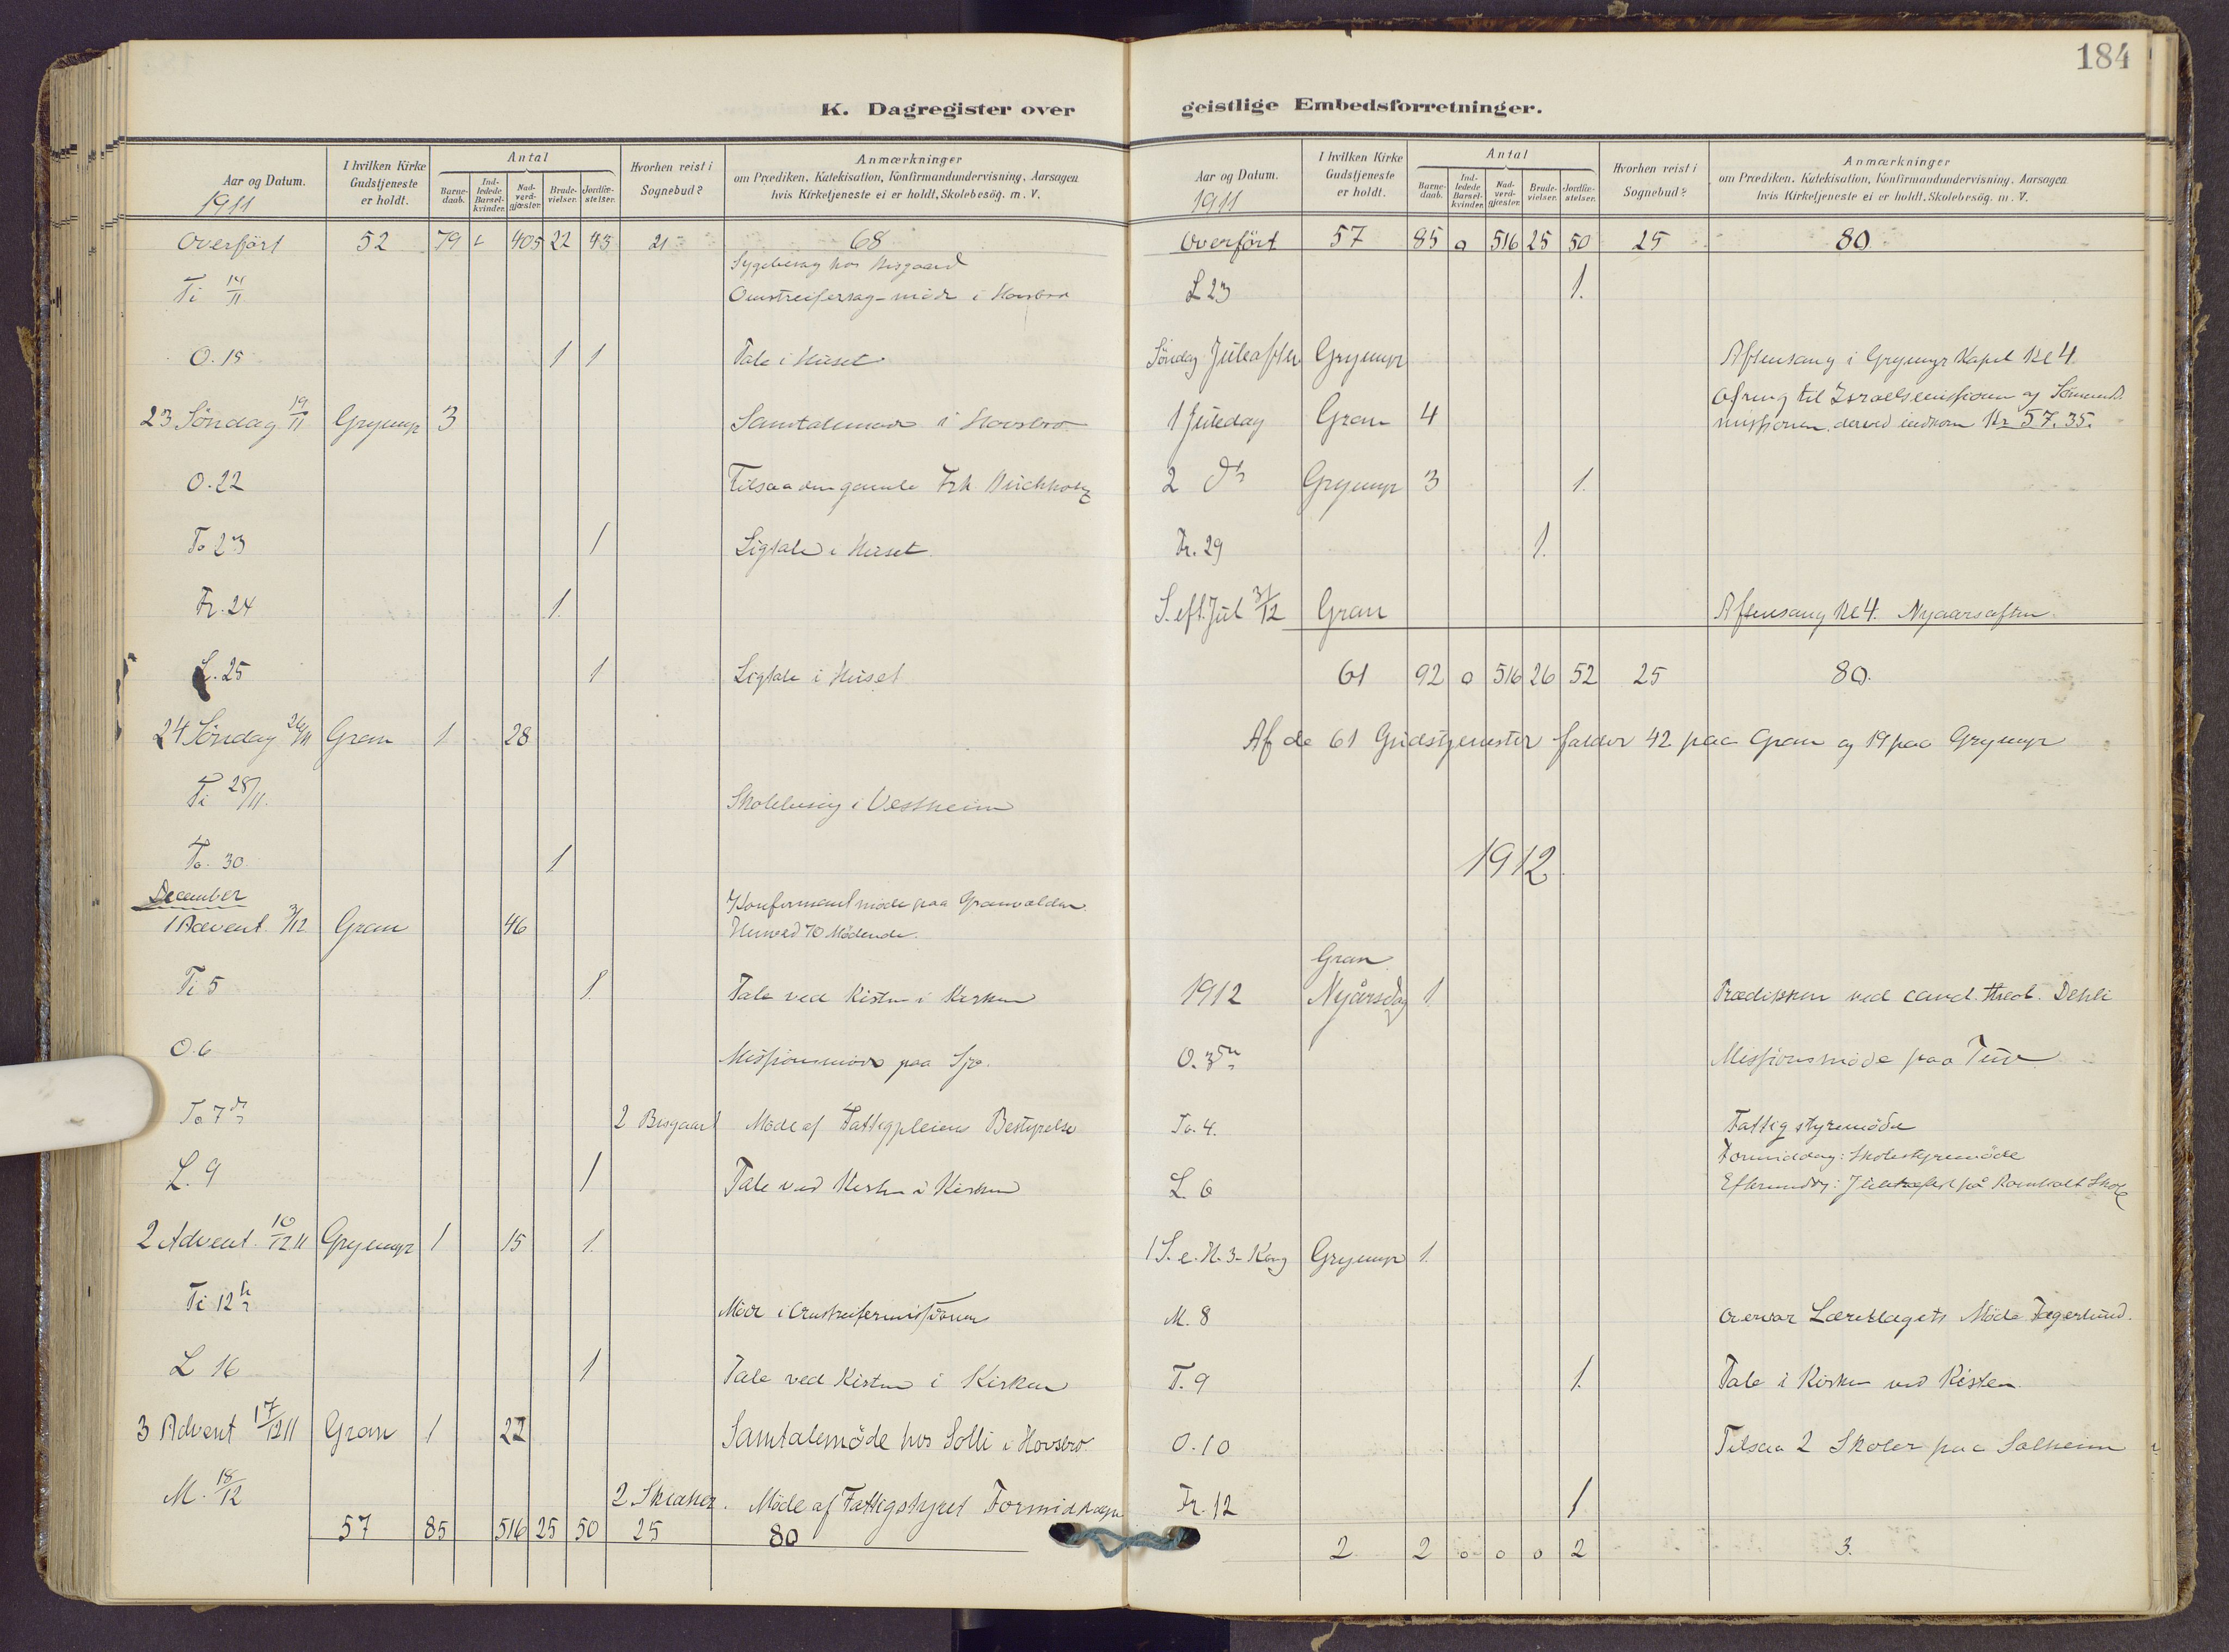 SAH, Gran prestekontor, Ministerialbok nr. 22, 1908-1918, s. 184